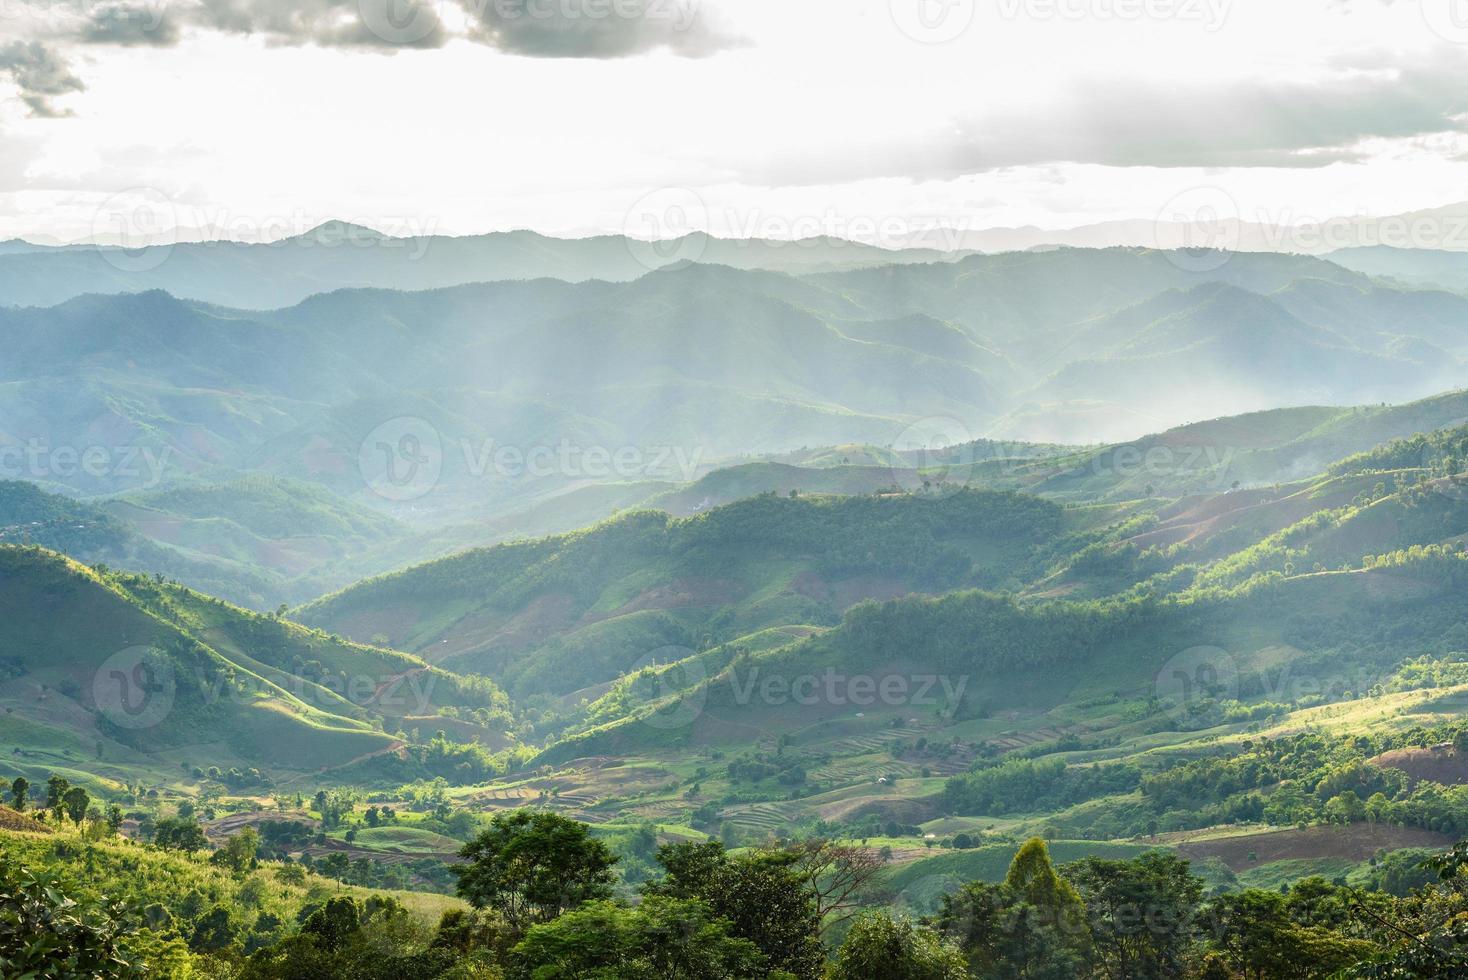 zomer bergen groen gras en blauwe hemel landschap foto